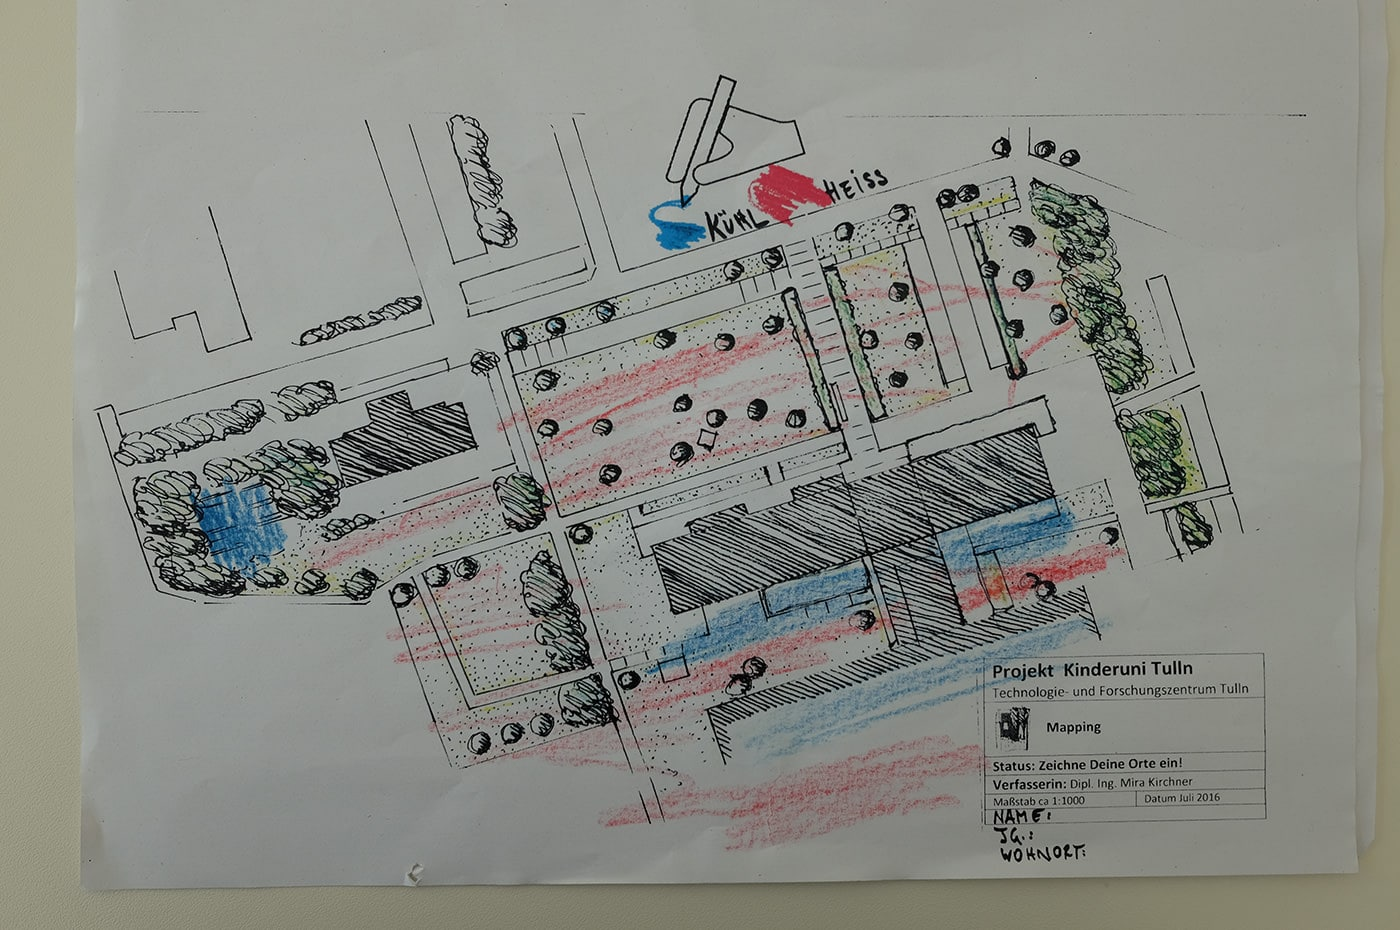 MK Landschaftsarchitektur - Projekt Klimabewusst